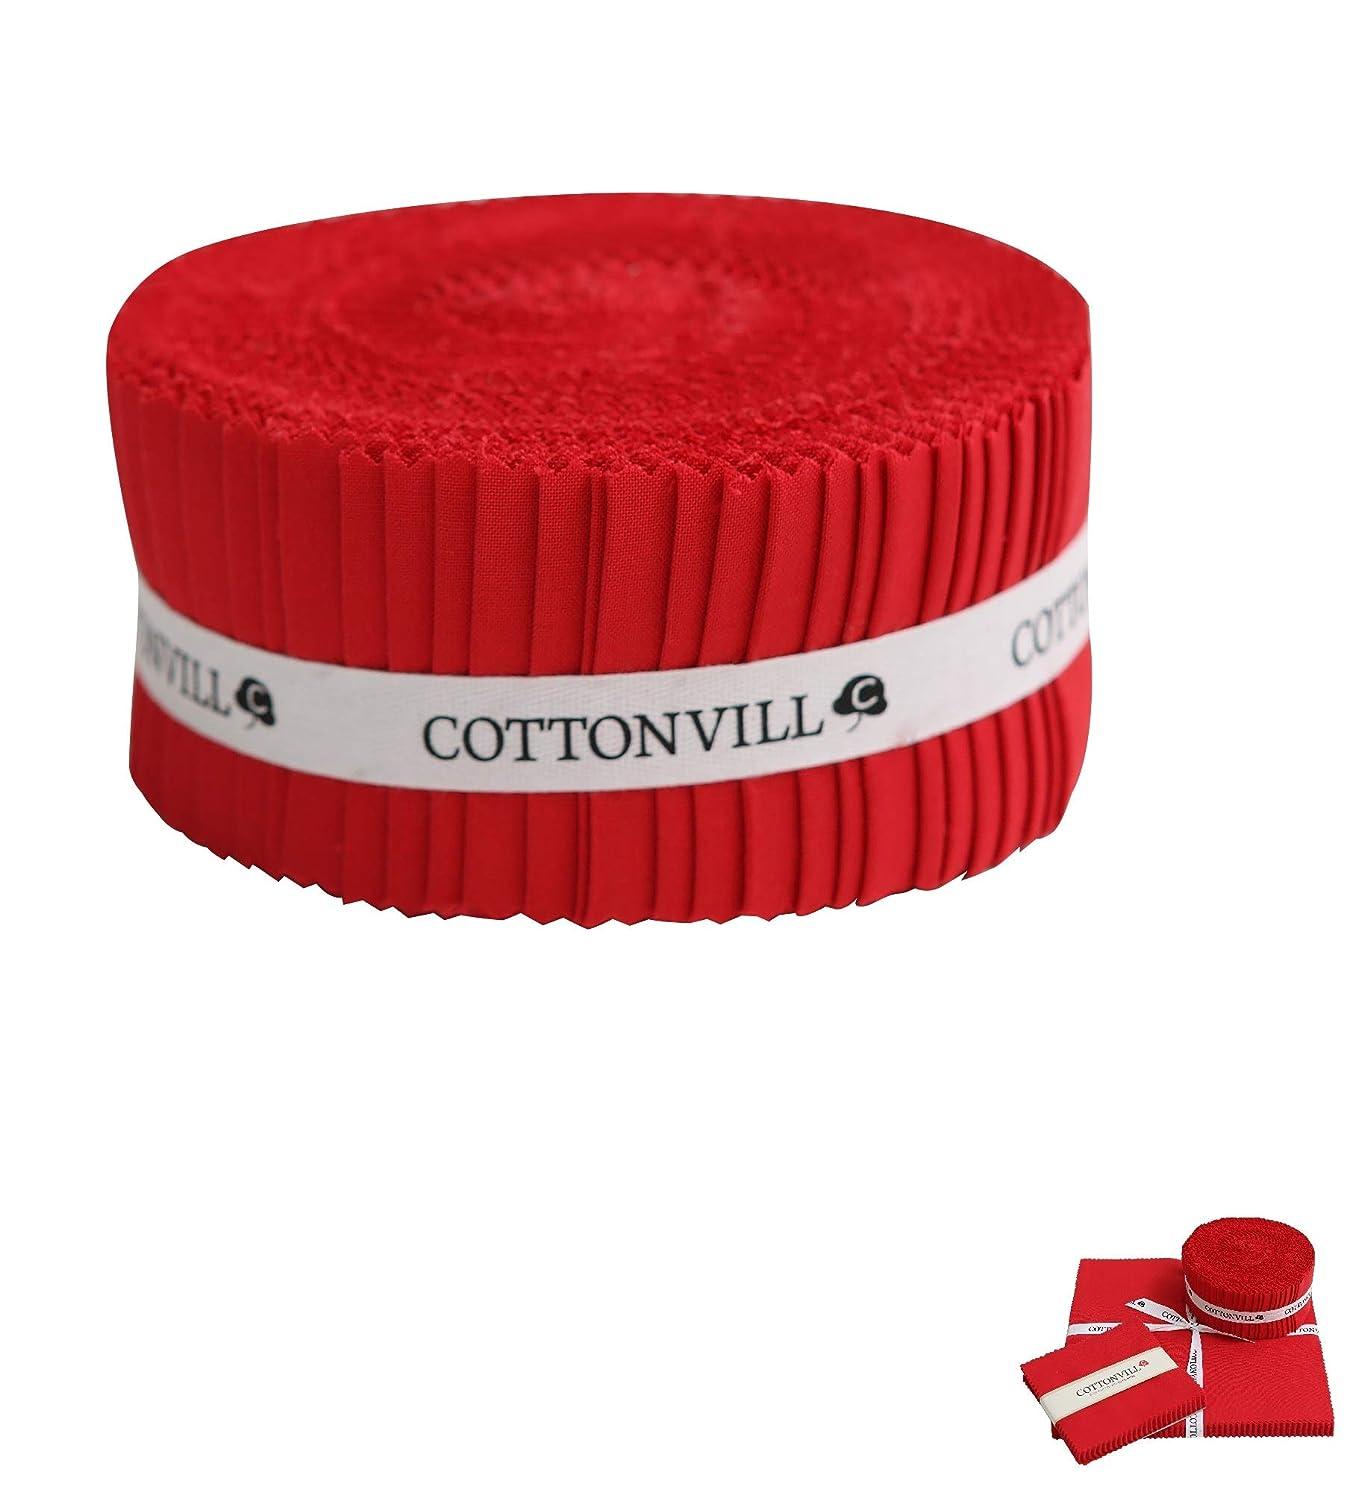 COTTONVILL Cotton Solid Precut Quilting Fabric Bundle 42 pcs, Red (2.5